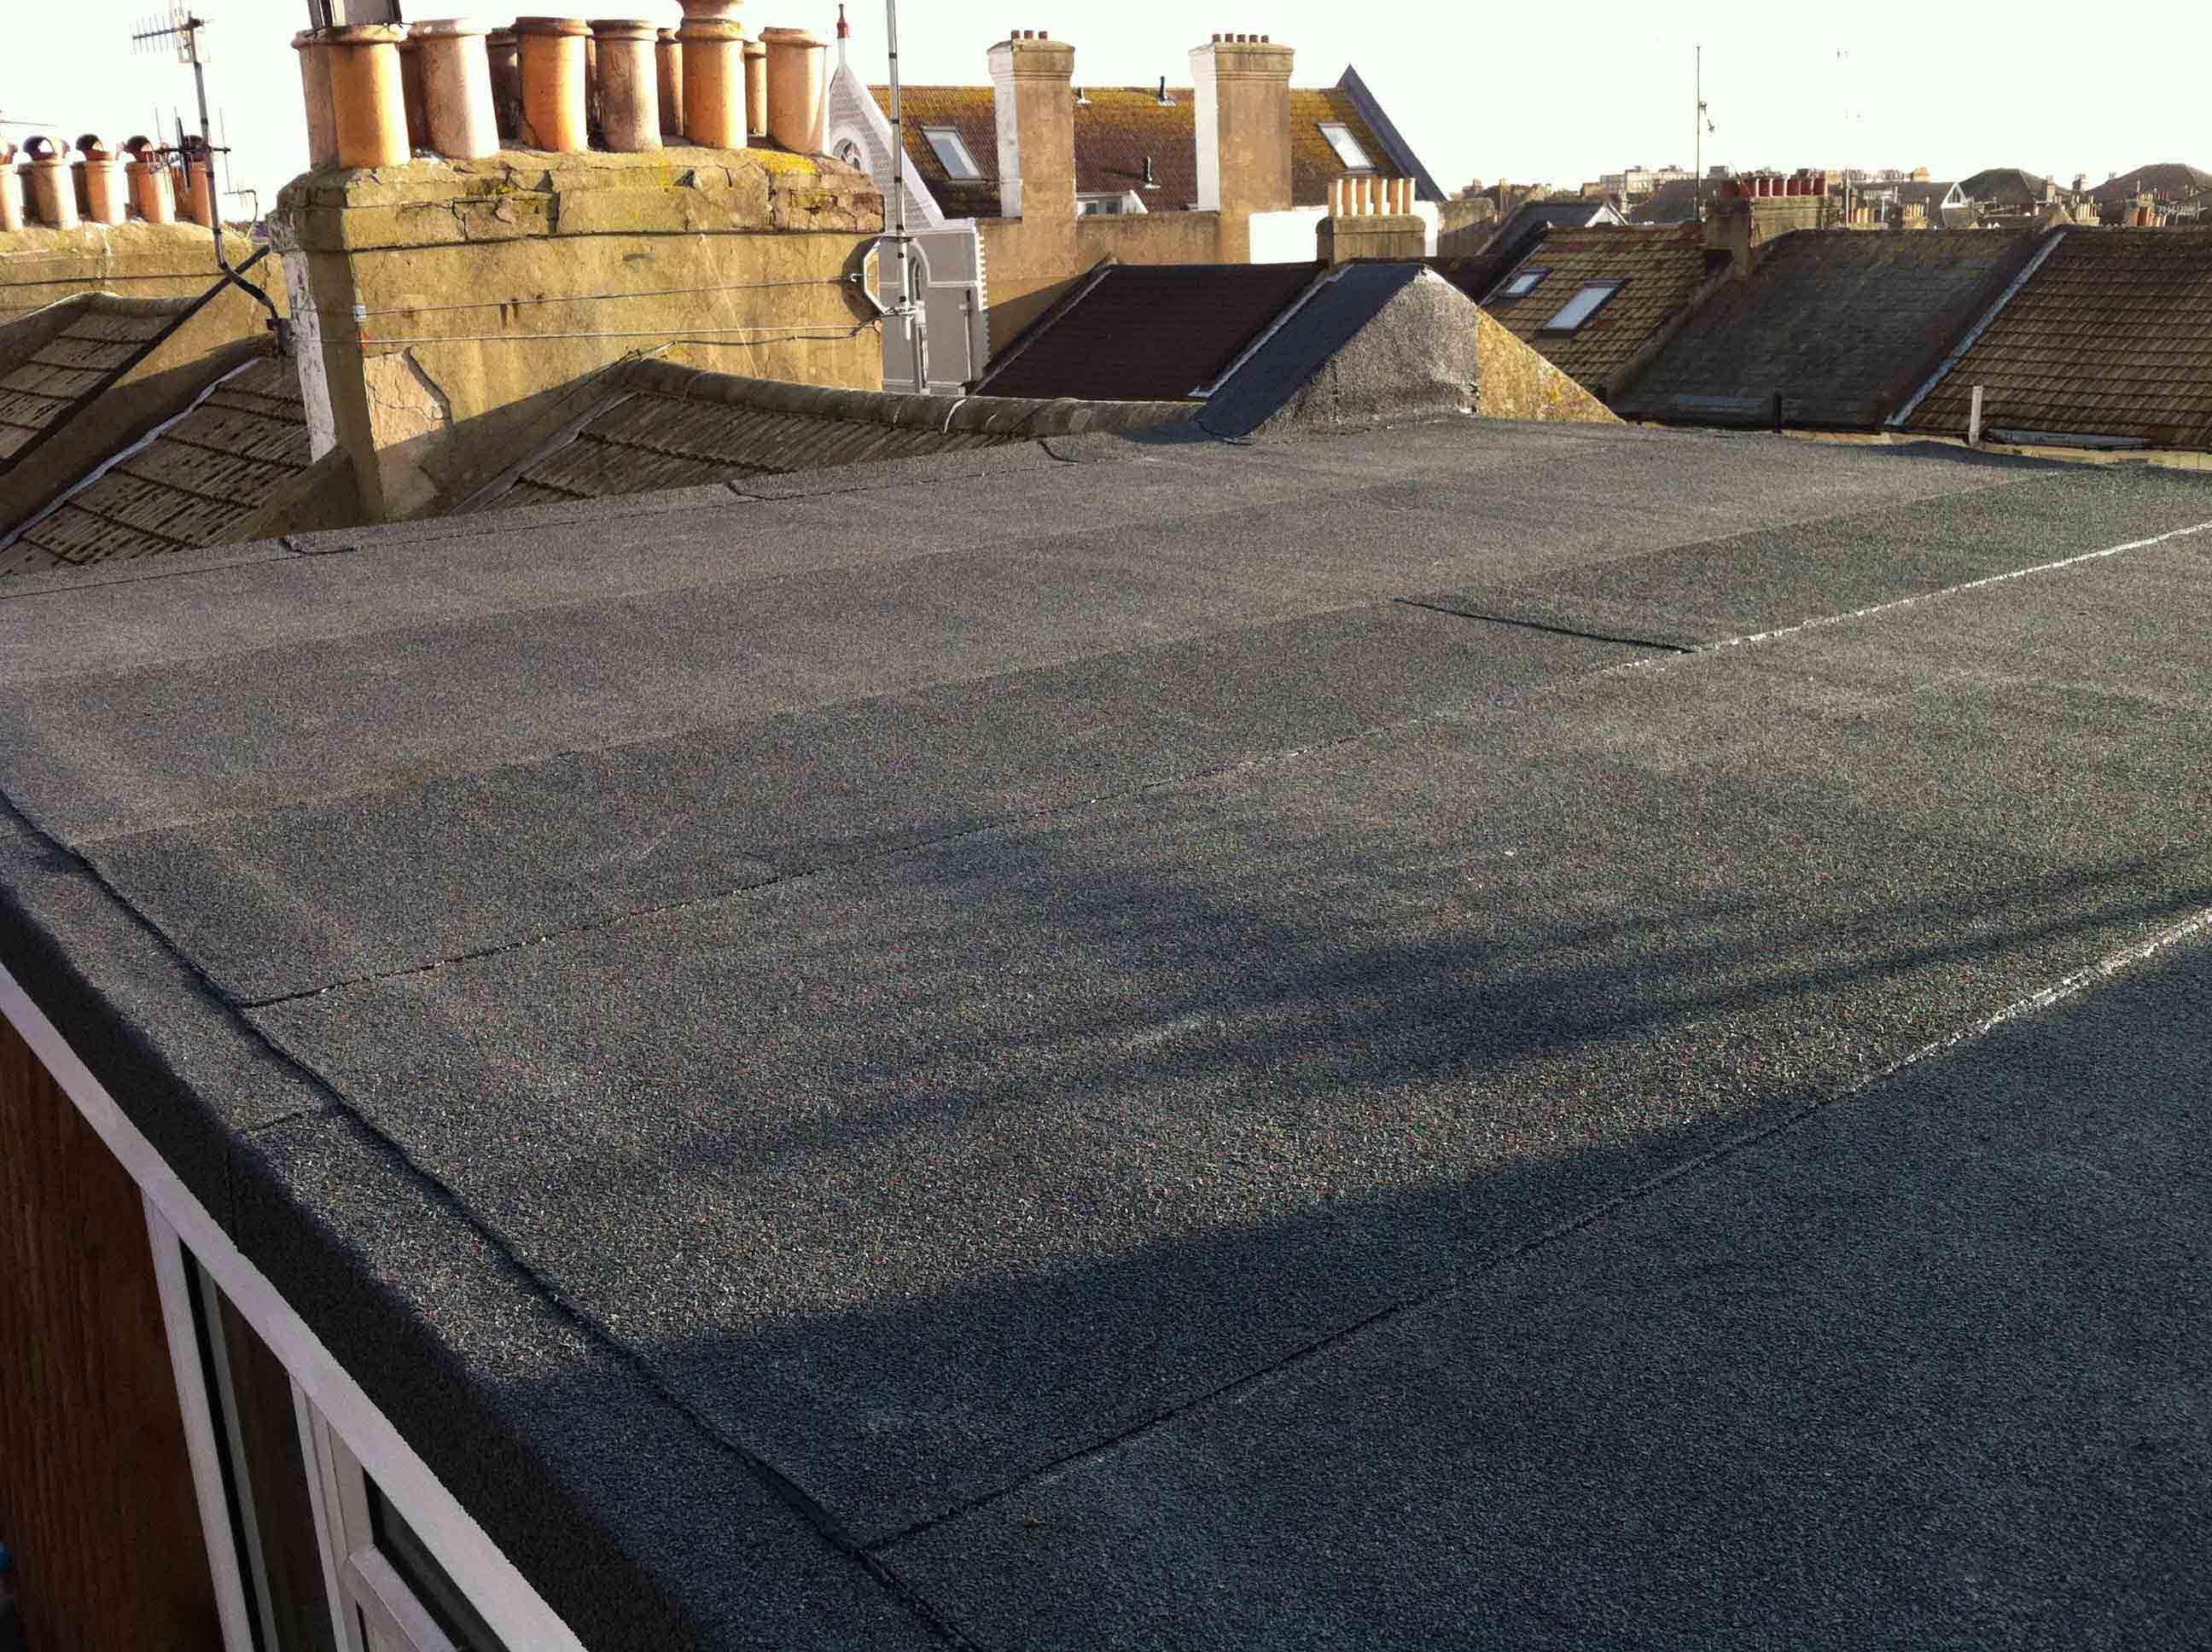 Mt Asphalt Mastic Asphalt And Built Up Felt Roofing Specialists Roofing Specialists Asphalt Roof Roofing Felt